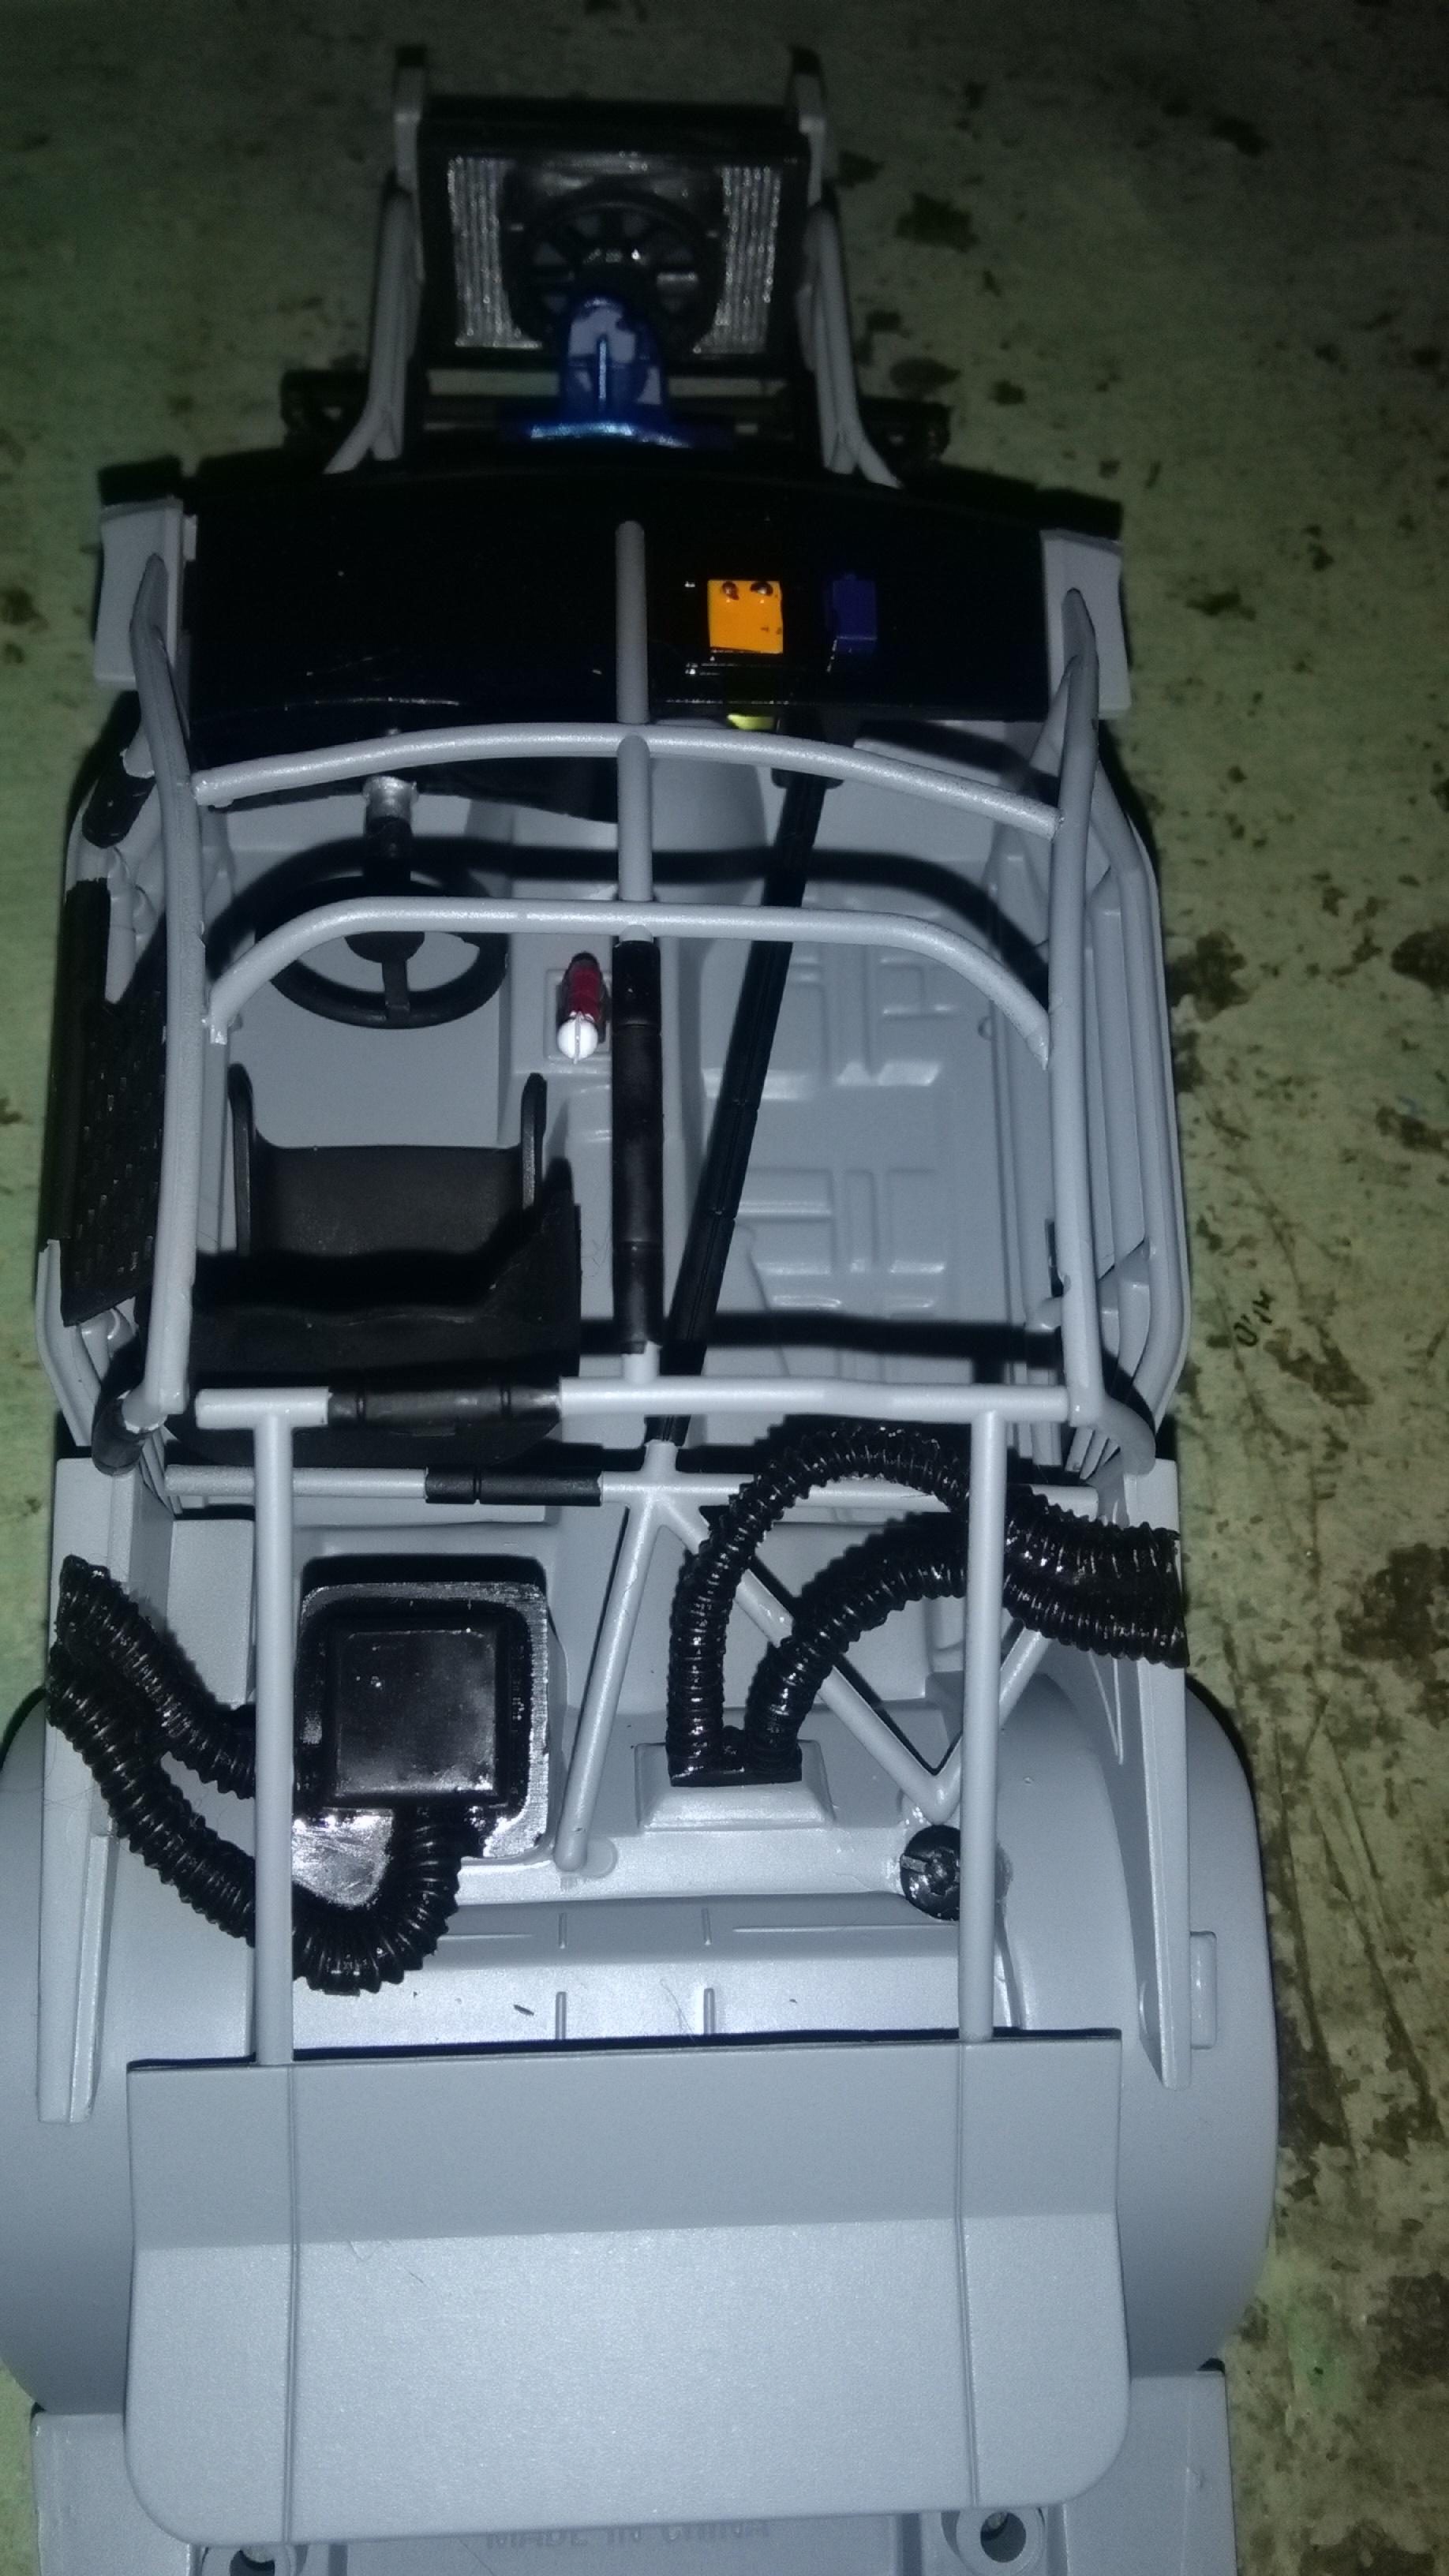 Ford Fusion Penskee 2014 #2 Brad K. Miller Lite - CHASE Version 811846F201328